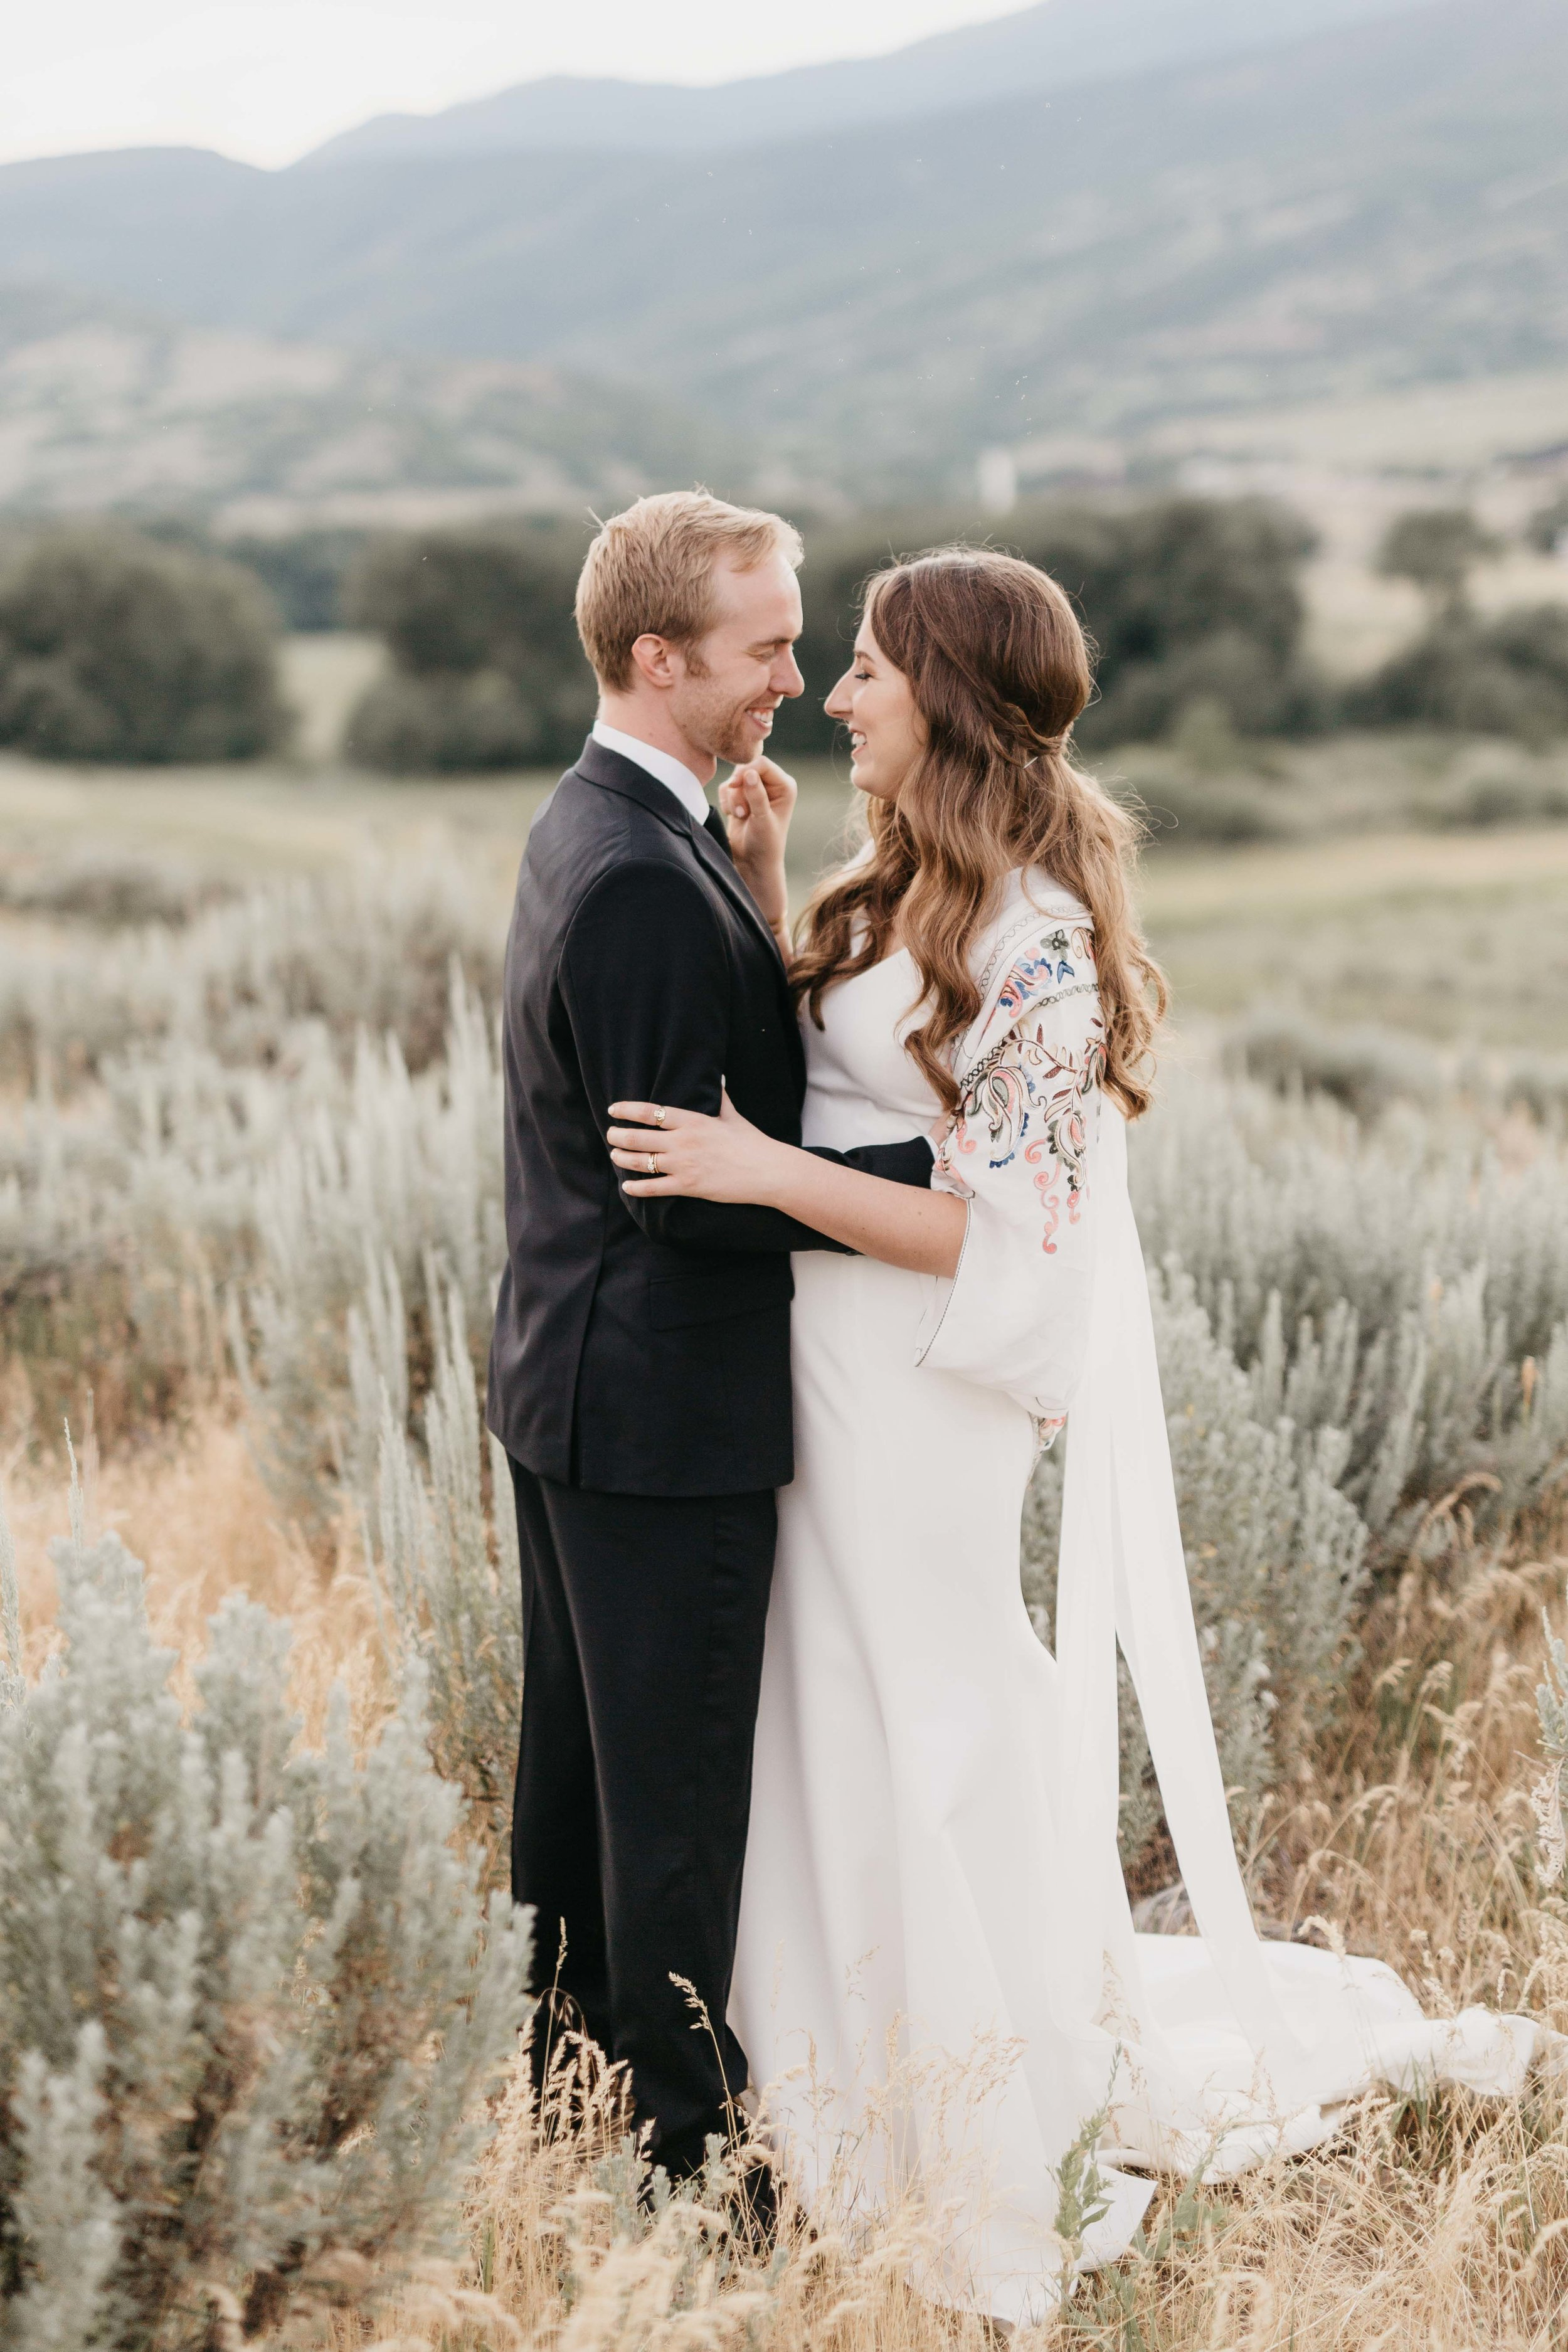 Utah-Wedding-Utah-Photographer-12.jpg